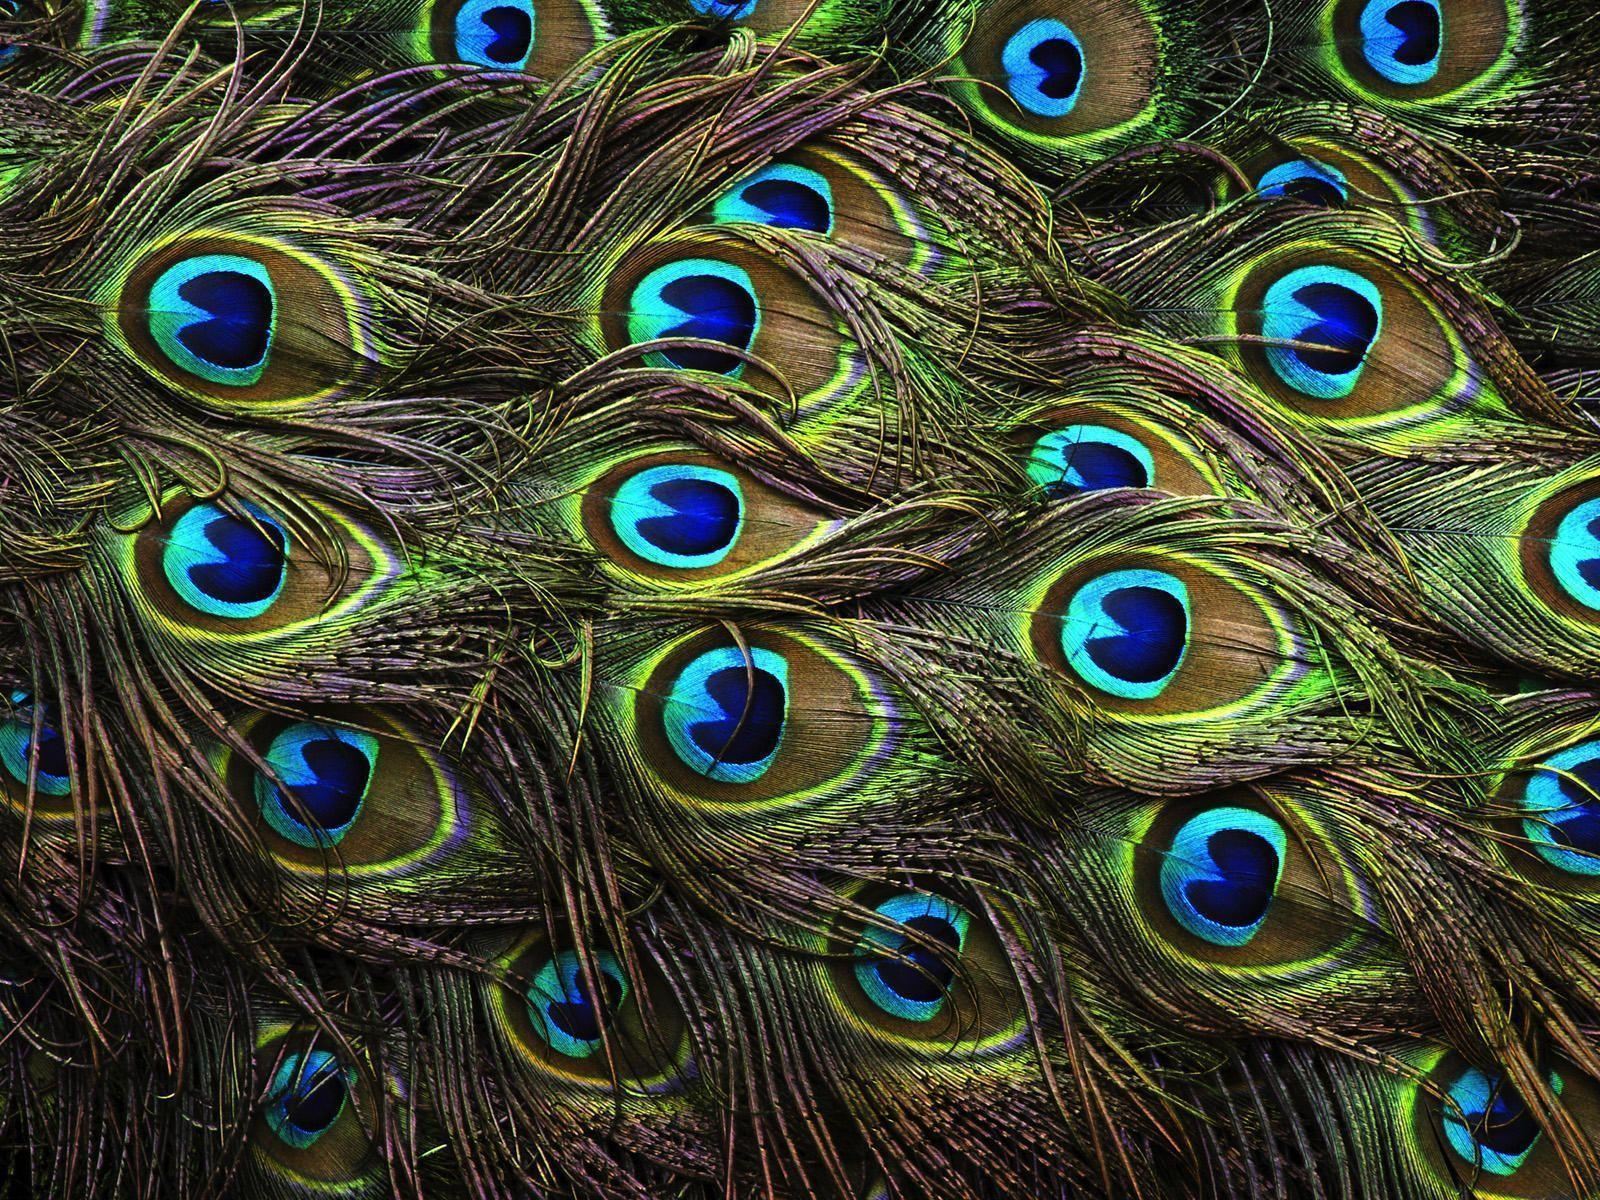 Peacock Desktop Wallpapers  Wallpaper Cave